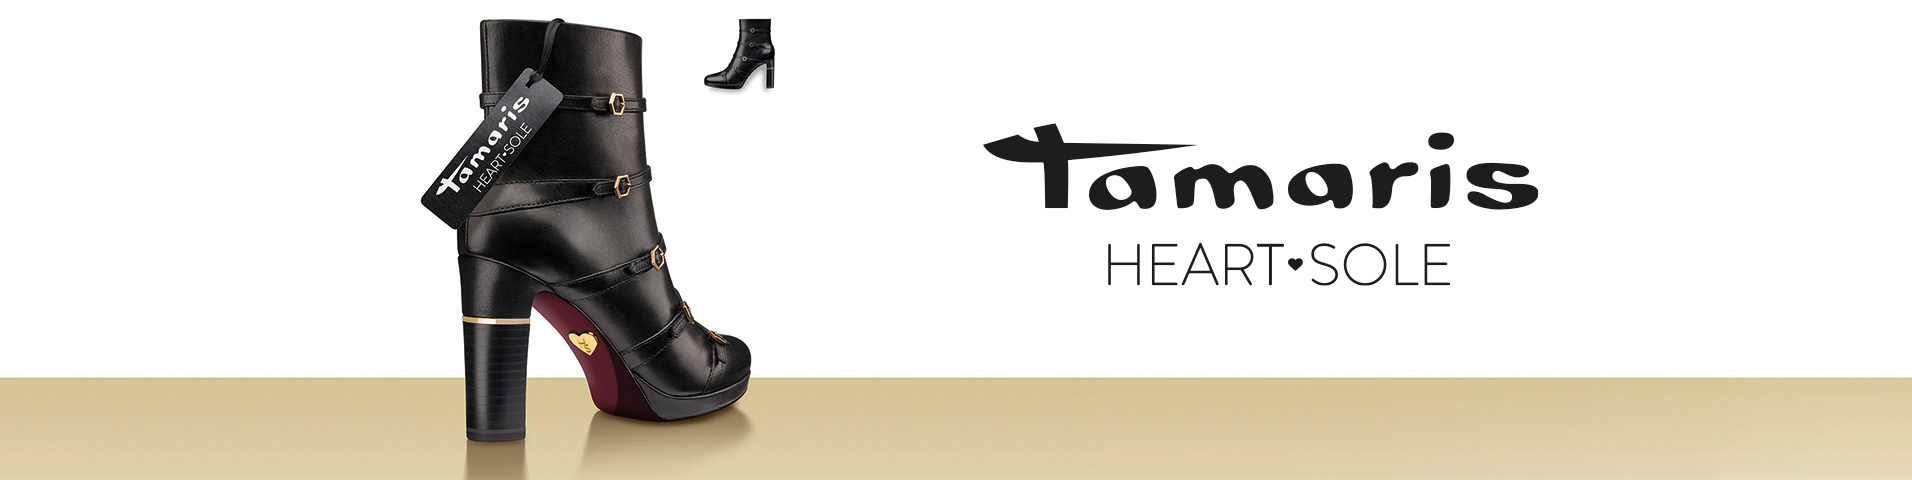 Spitze Tamaris Heart & Sole Pumps bei ZALANDO